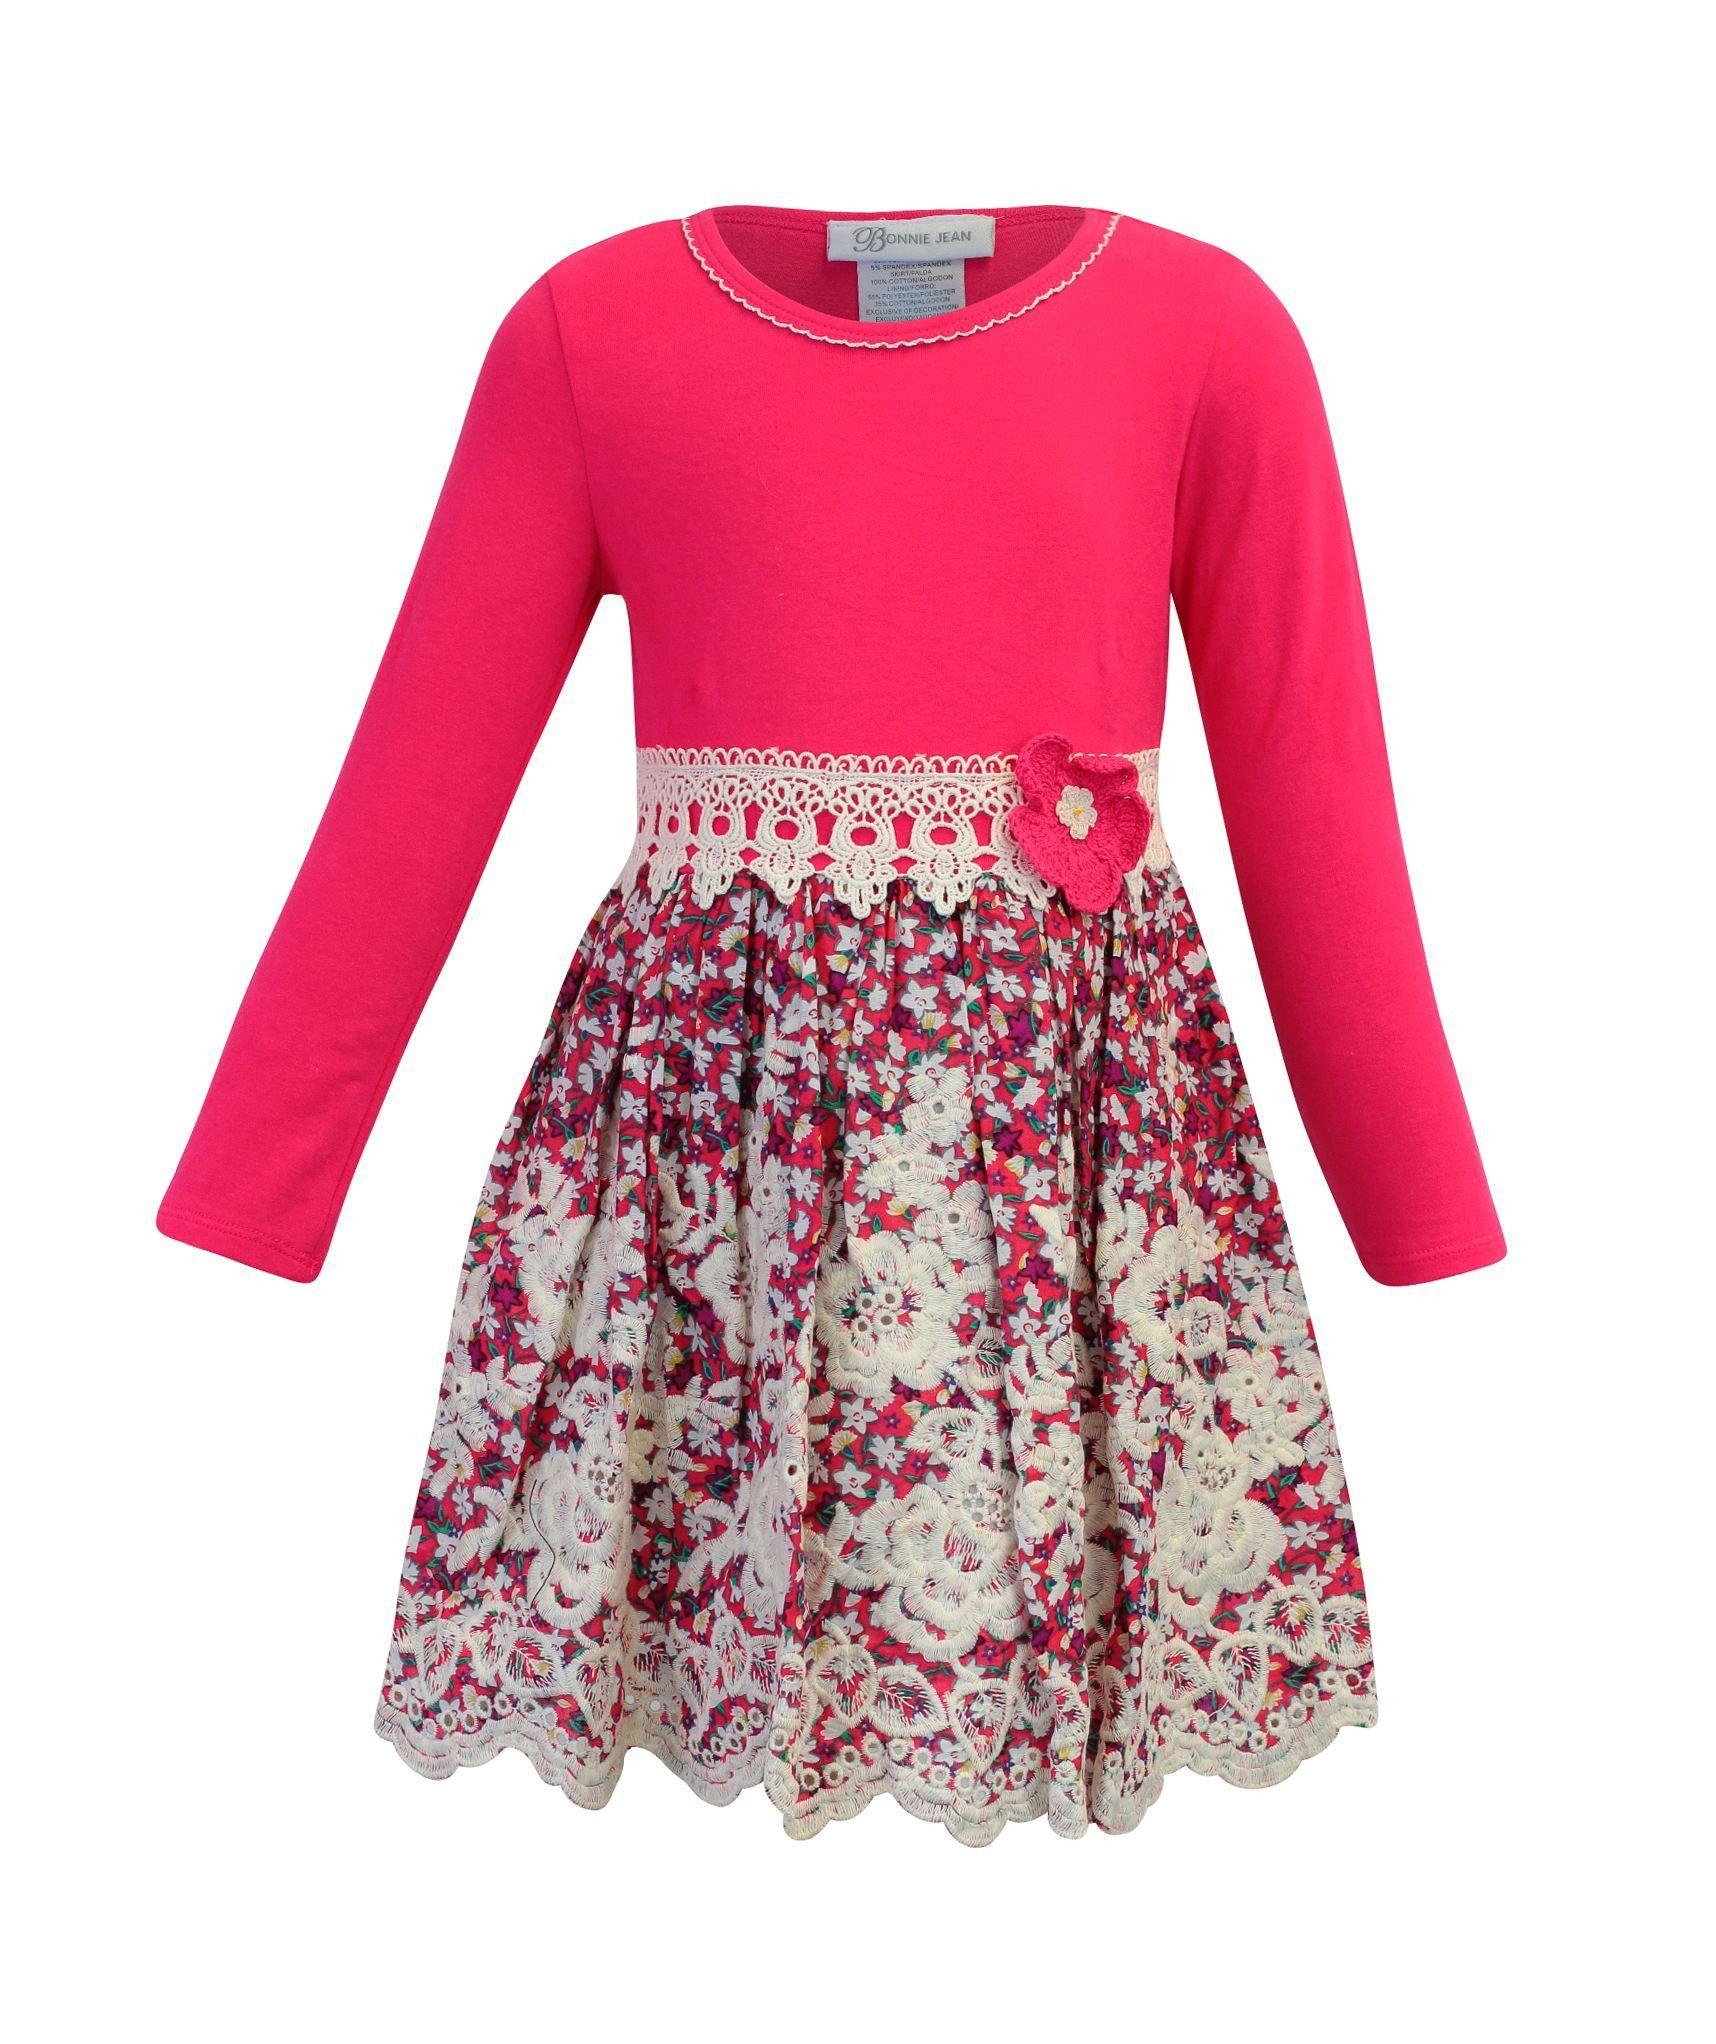 af5a21a7699 Bonnie Jean Little Girls 2- 6X Long Sleeve Mix Media Floral Print Dress